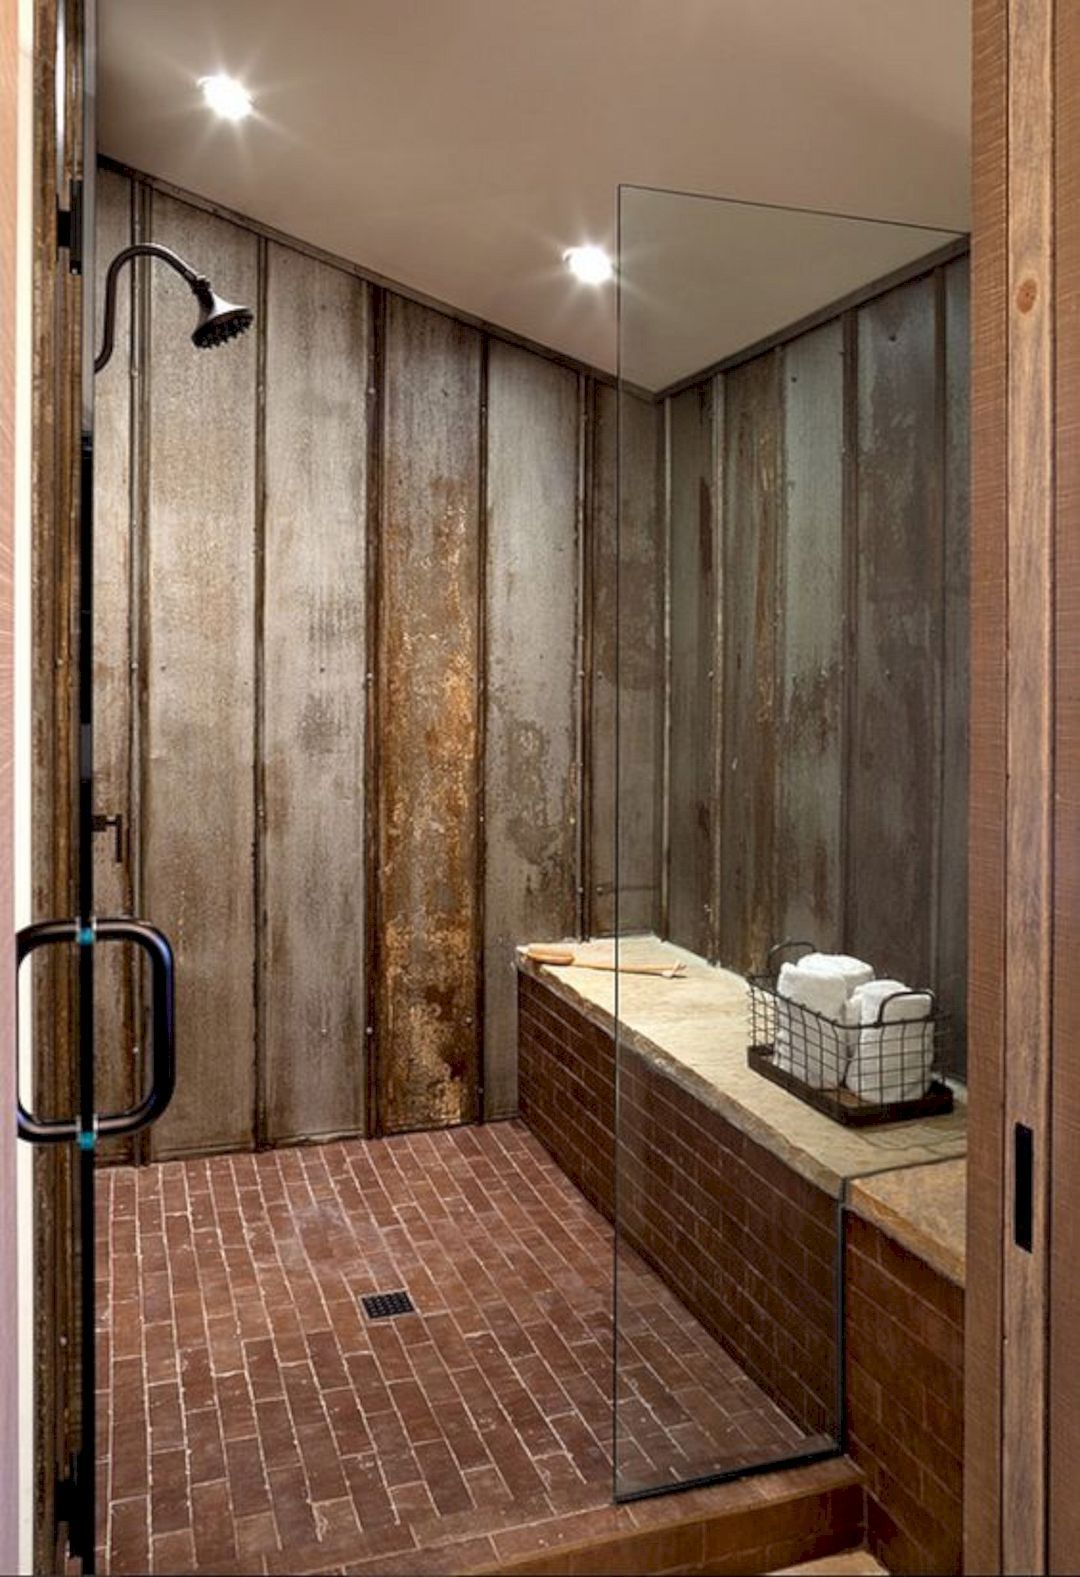 Amazing Rustic Bathroom Designs Html on amazing brown bathrooms, amazing simple bathrooms, amazing modern bathrooms, amazing cabin bathrooms, amazing country bathrooms, amazing natural bathrooms, amazing black bathrooms, amazing victorian bathrooms, amazing beach bathrooms, amazing small bathrooms, amazing blue bathrooms, amazing exotic bathrooms, amazing romantic bathrooms, amazing white bathrooms,